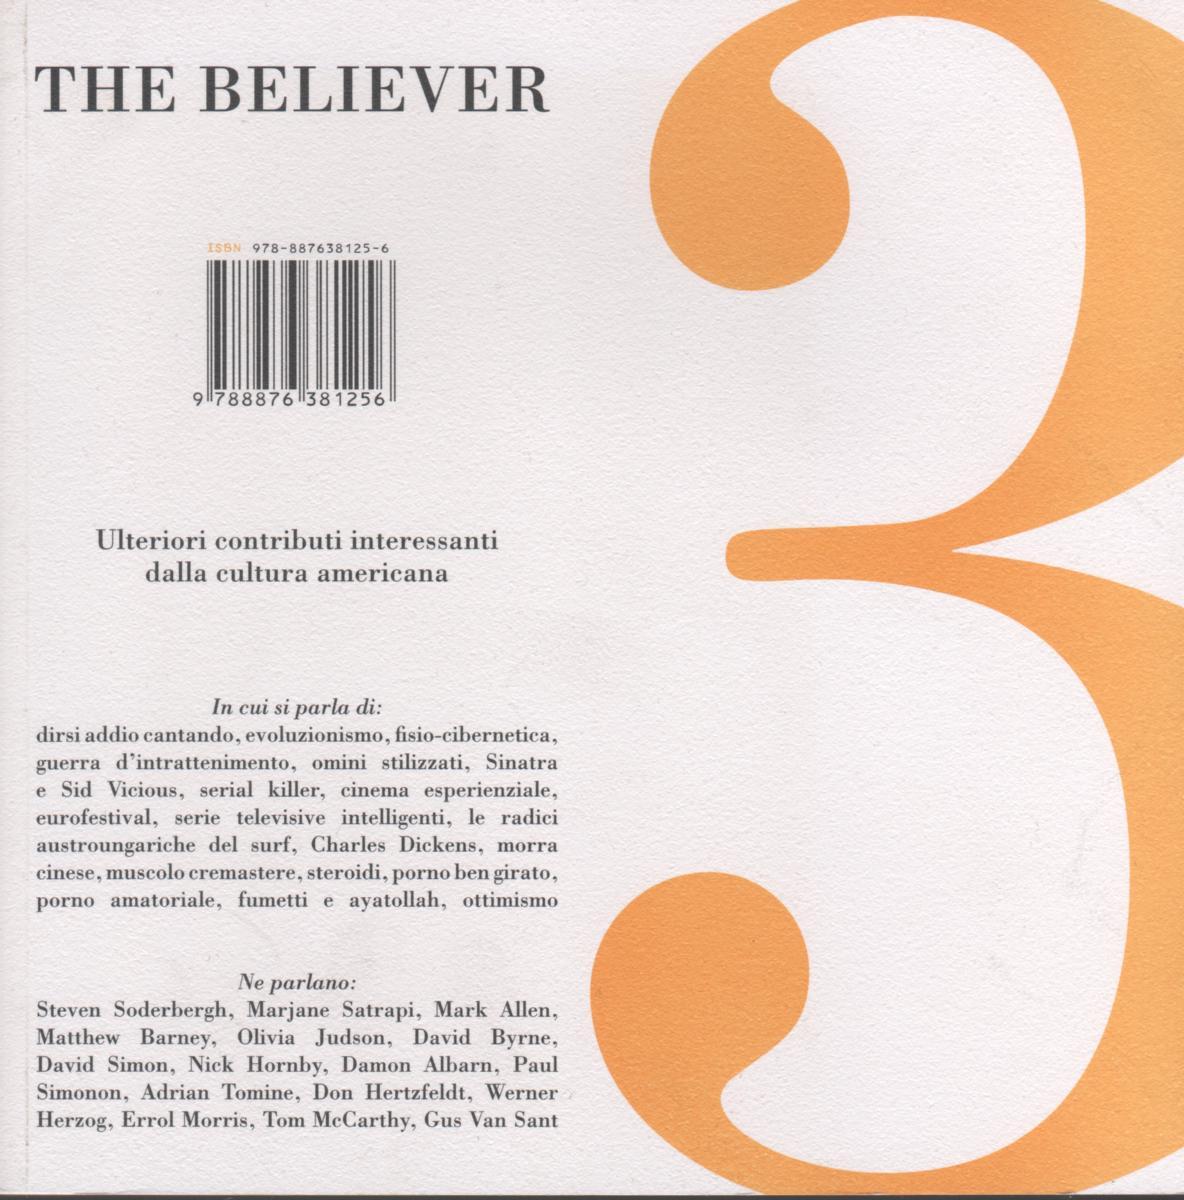 The Believer/3